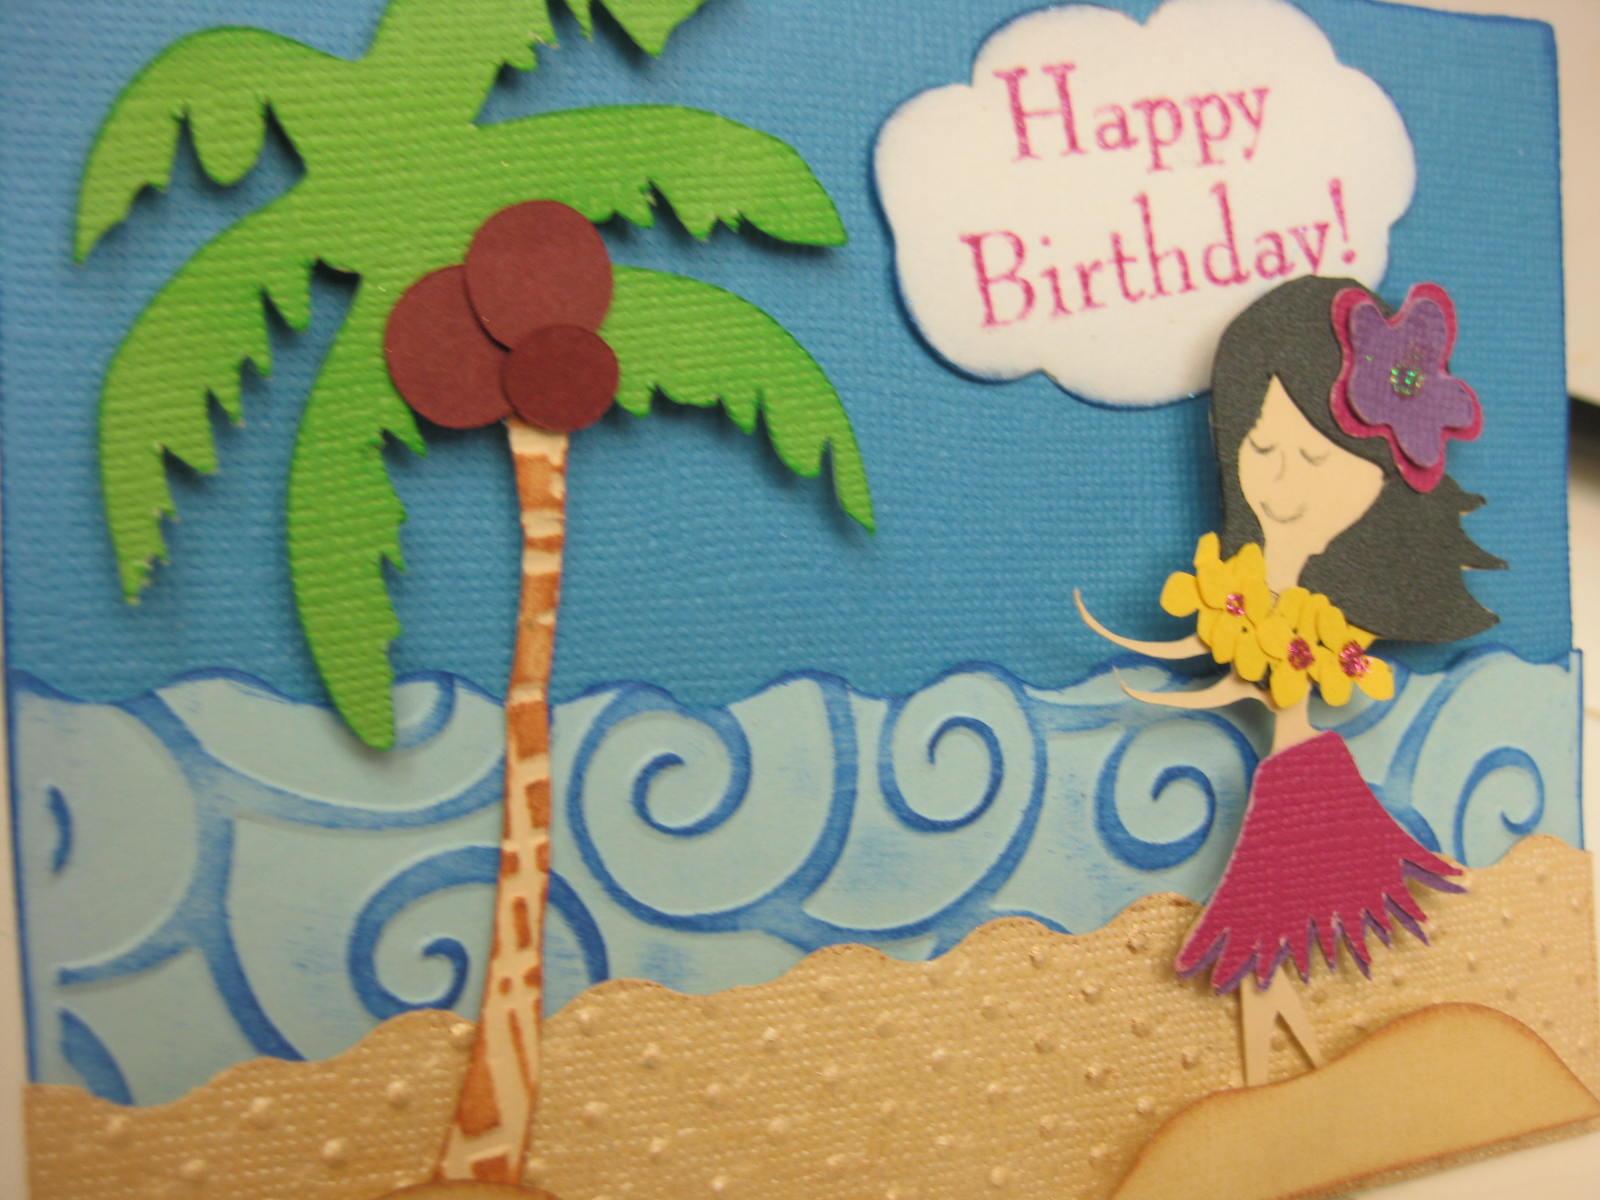 spontaneously us hawaii themed birthday card, Birthday card